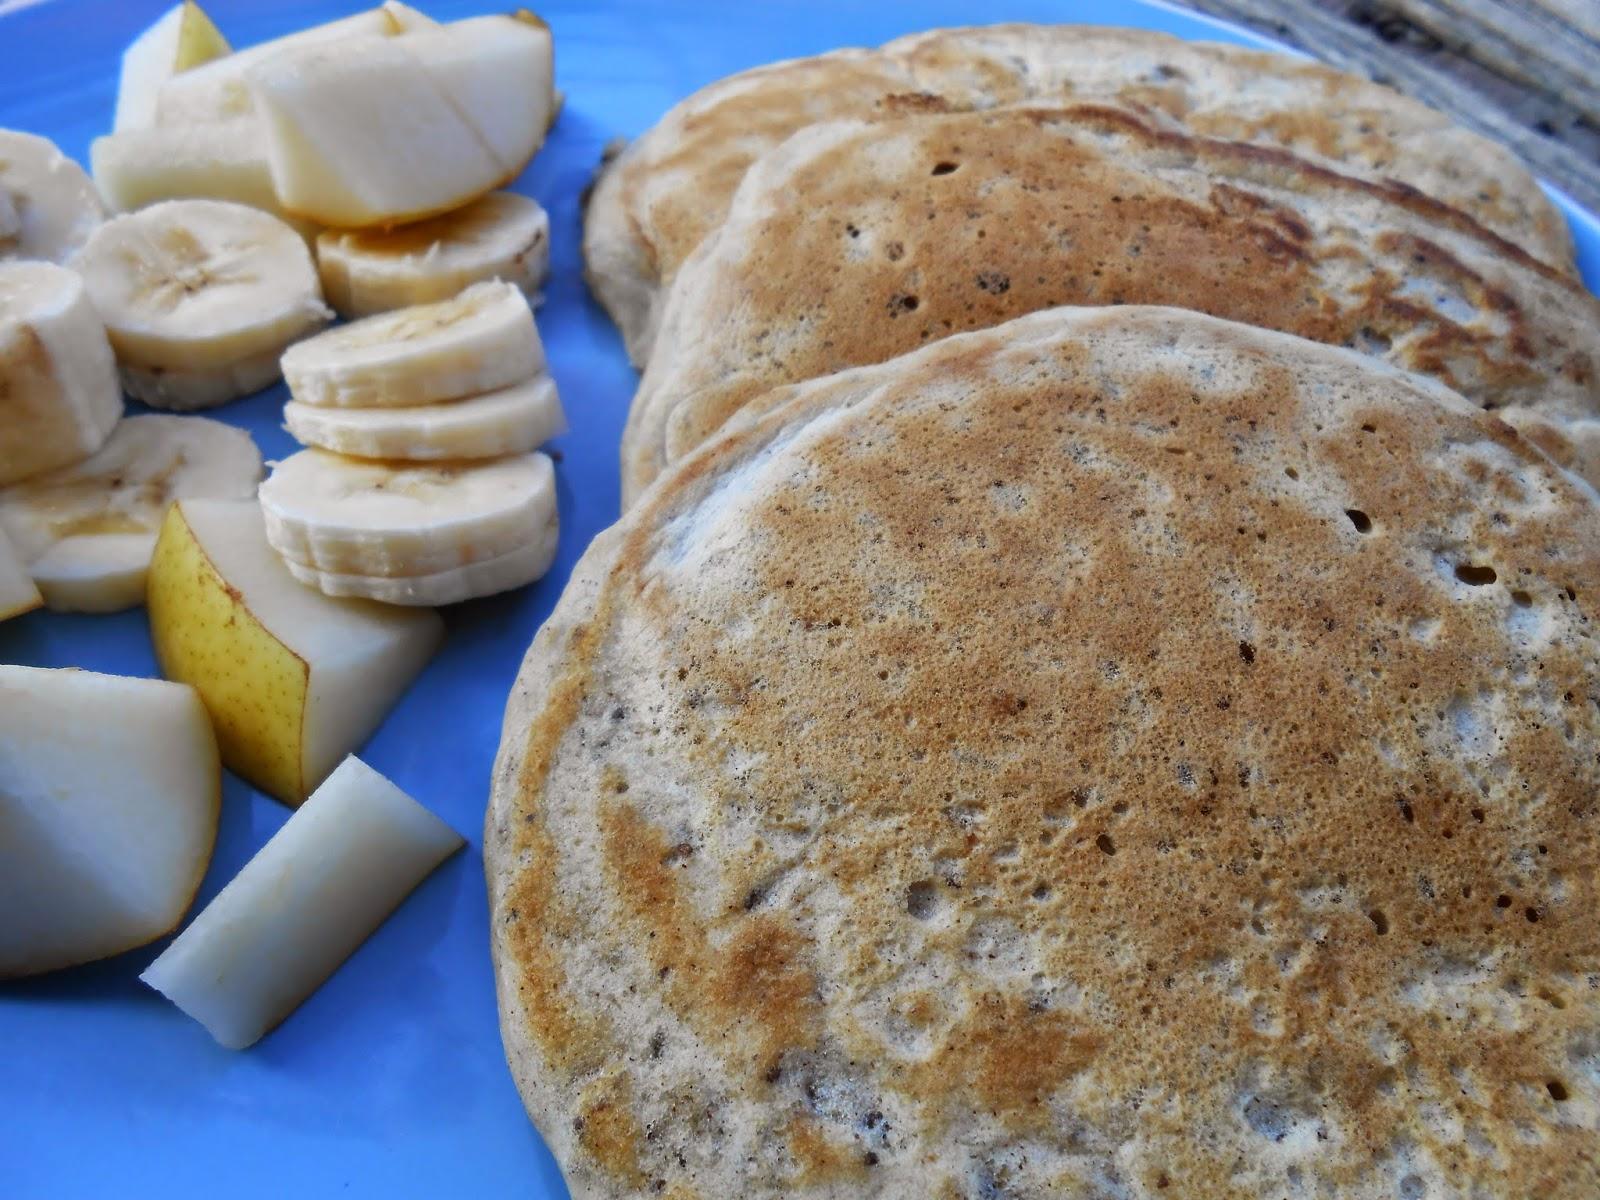 Déjeuners/Muffins/Yogourt